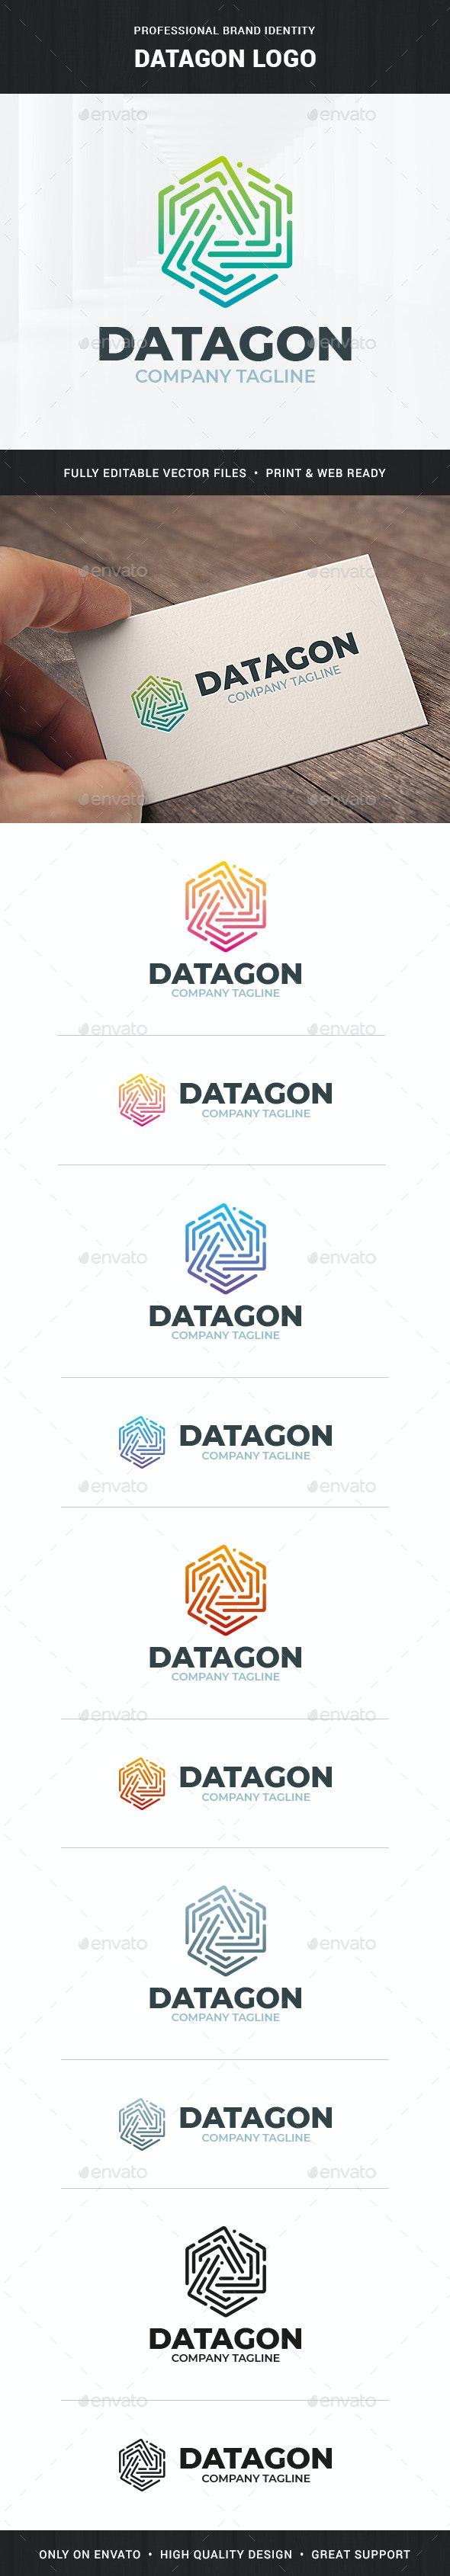 Datagon Logo Template - Abstract Logo Templates